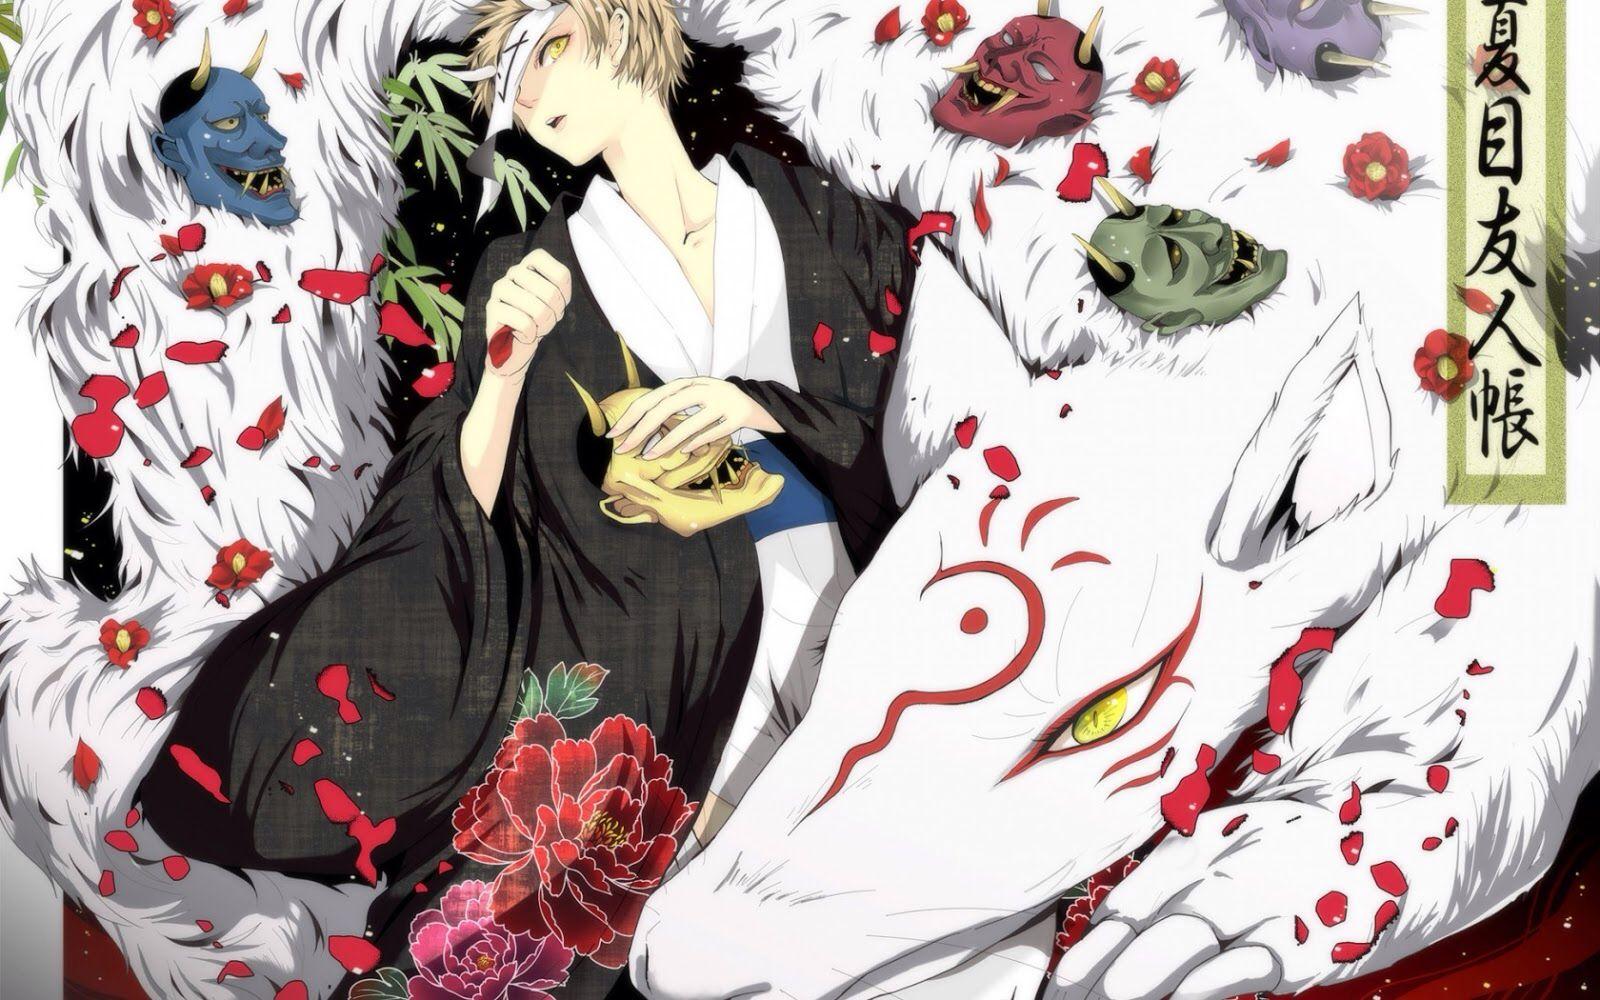 Fox spirit boy | manga/anime art | Pinterest | Foxes ...